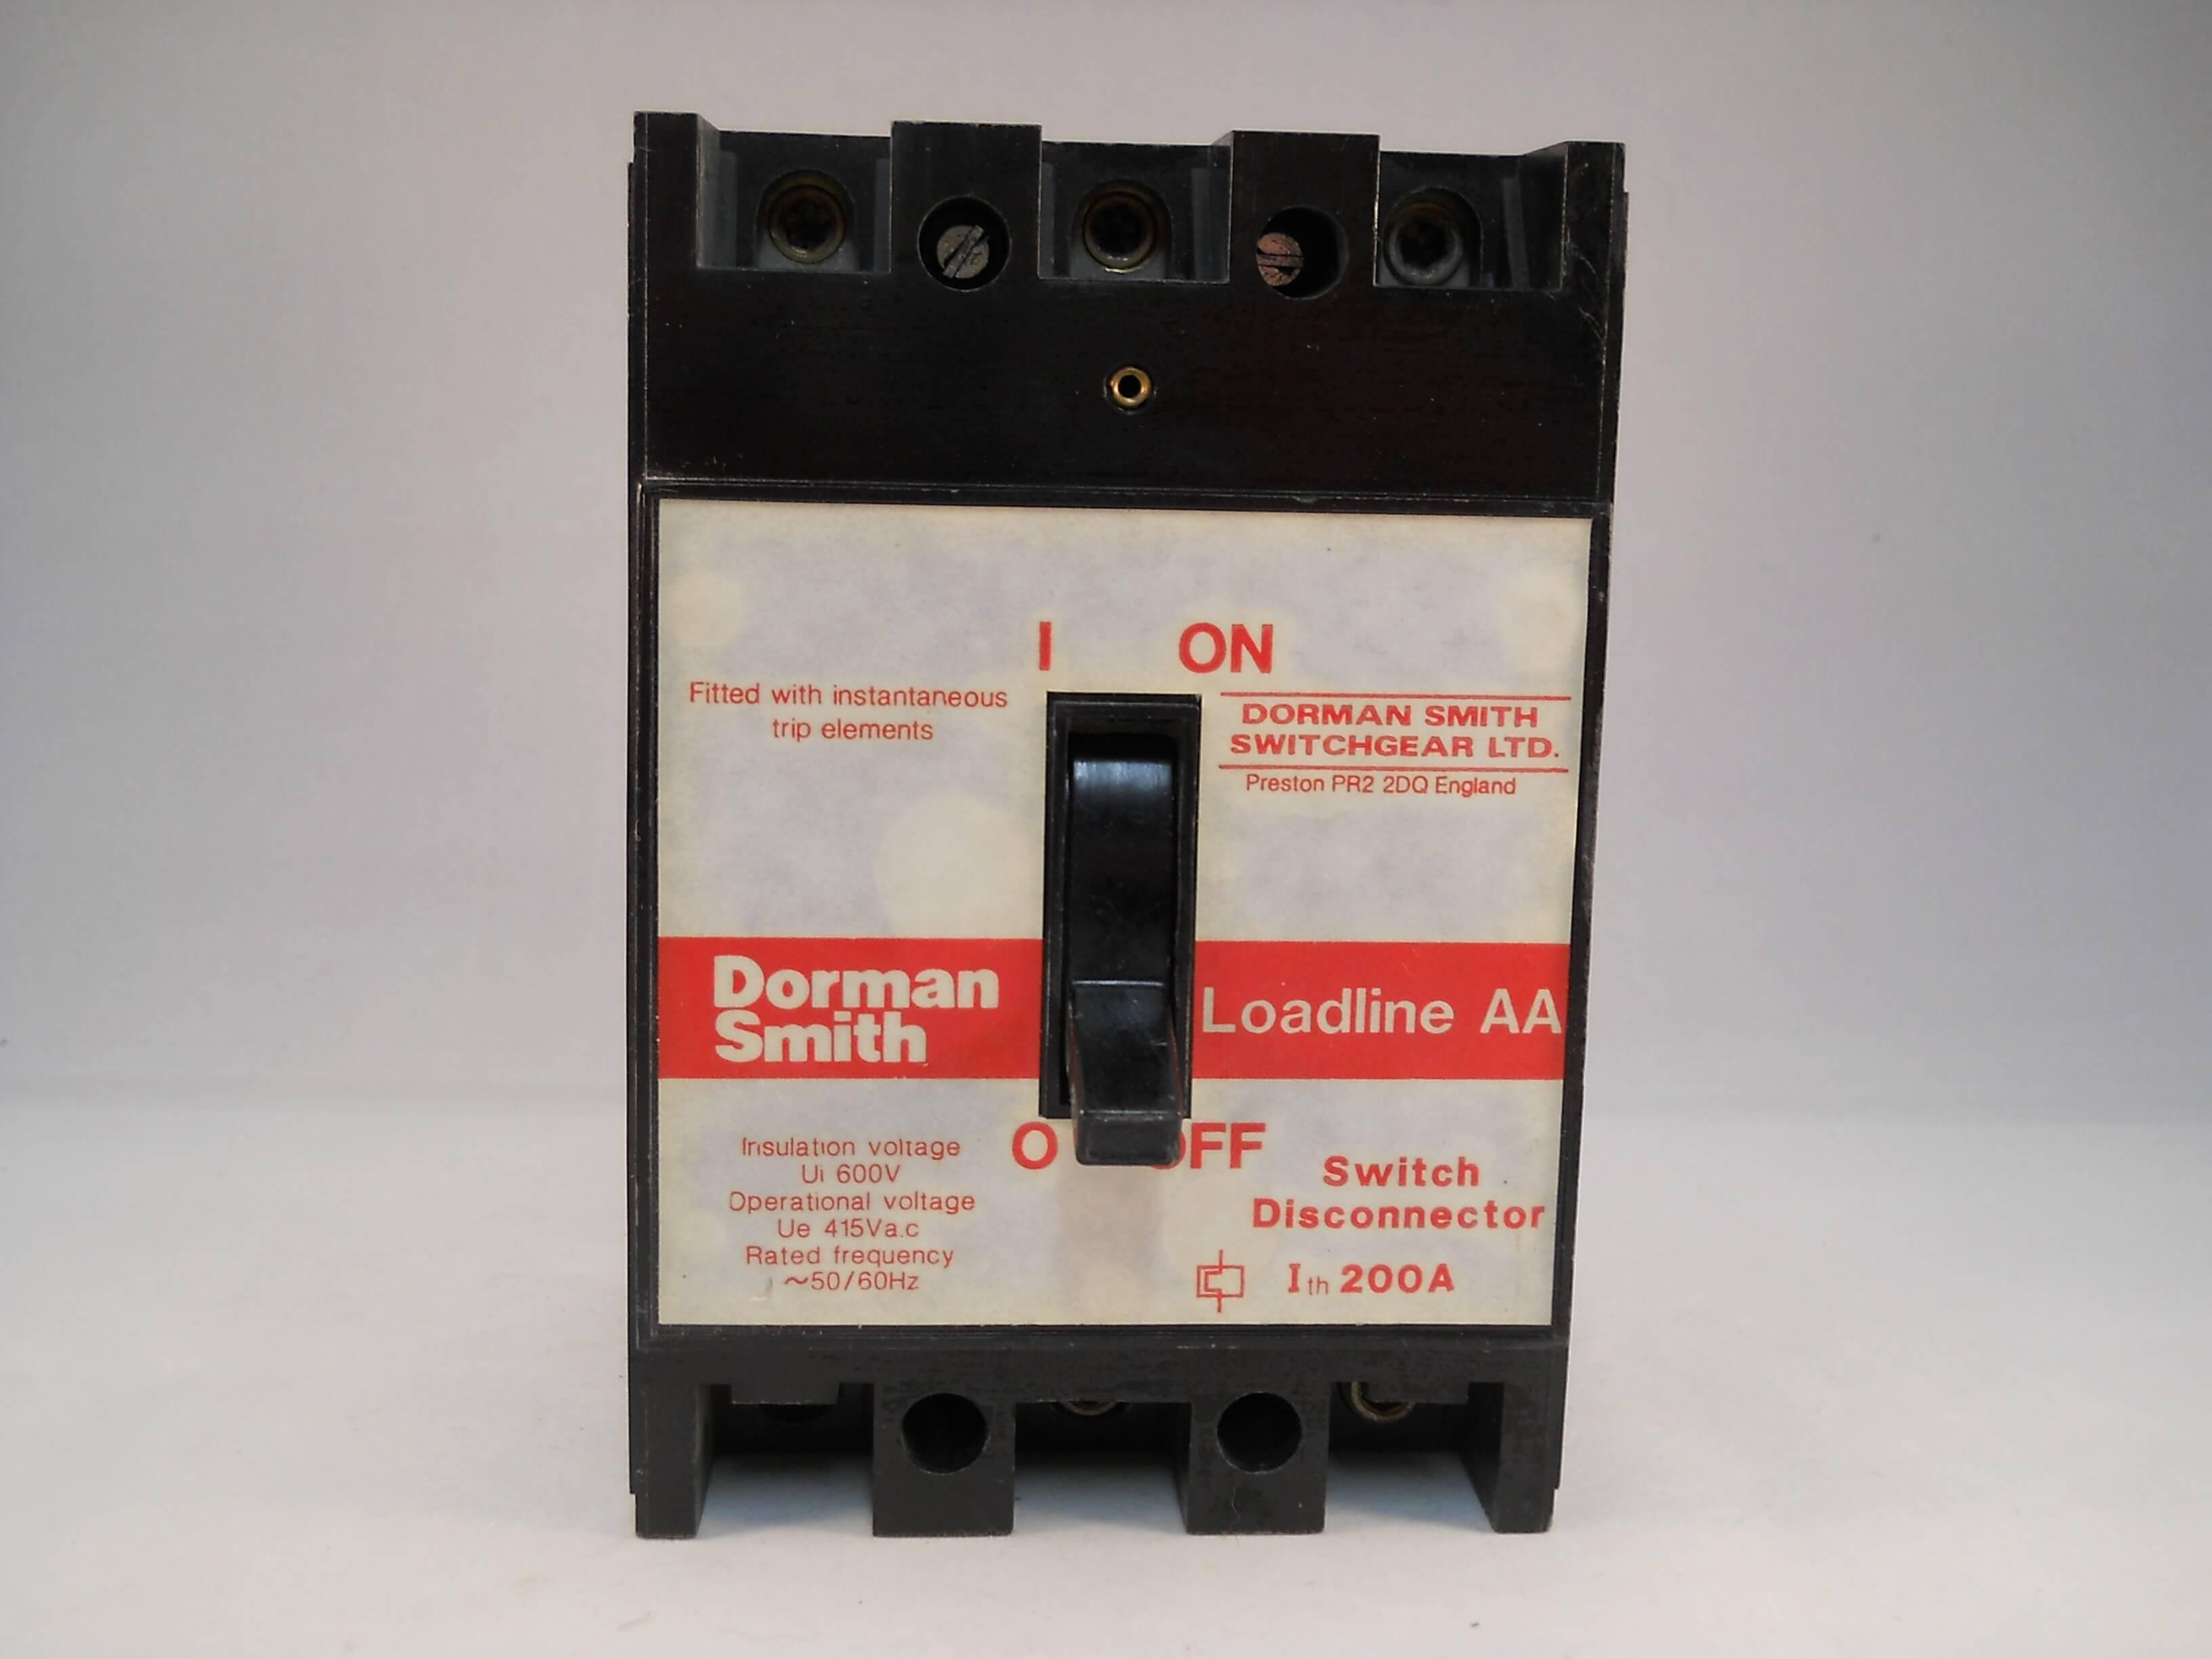 dorman smith loadline 200 amp triple pole 200a switch. Black Bedroom Furniture Sets. Home Design Ideas